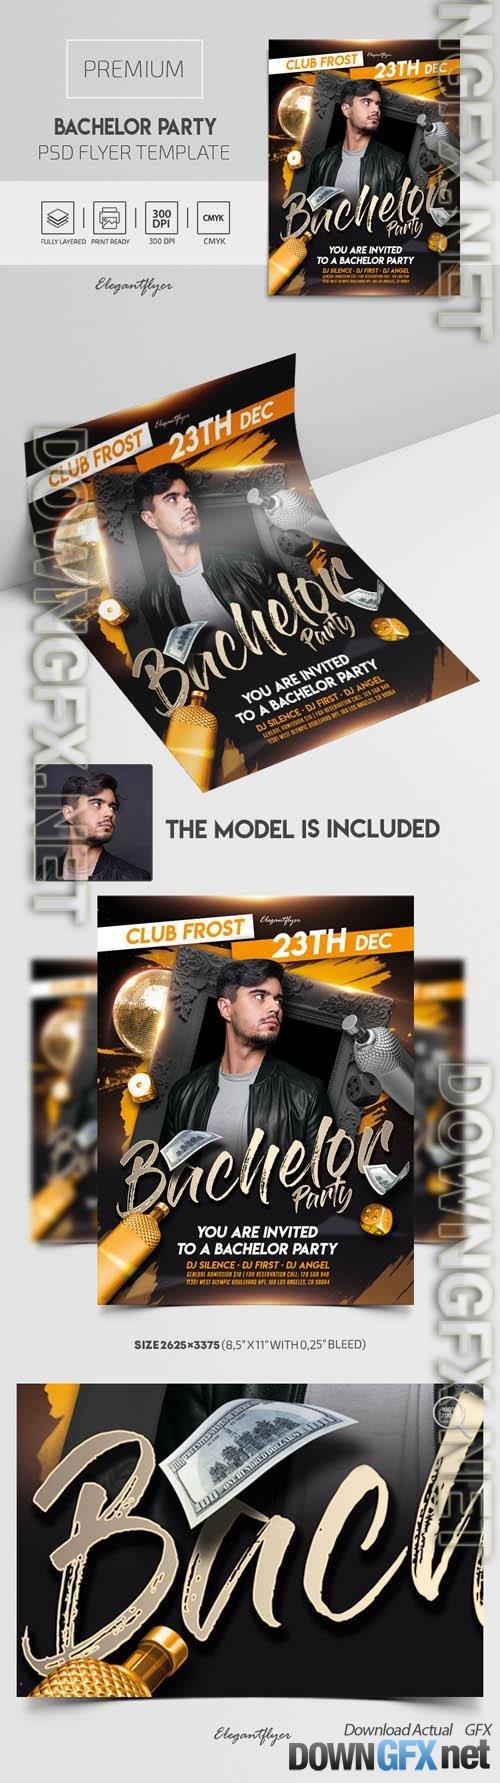 Bachelor Party Premium PSD Flyer Template